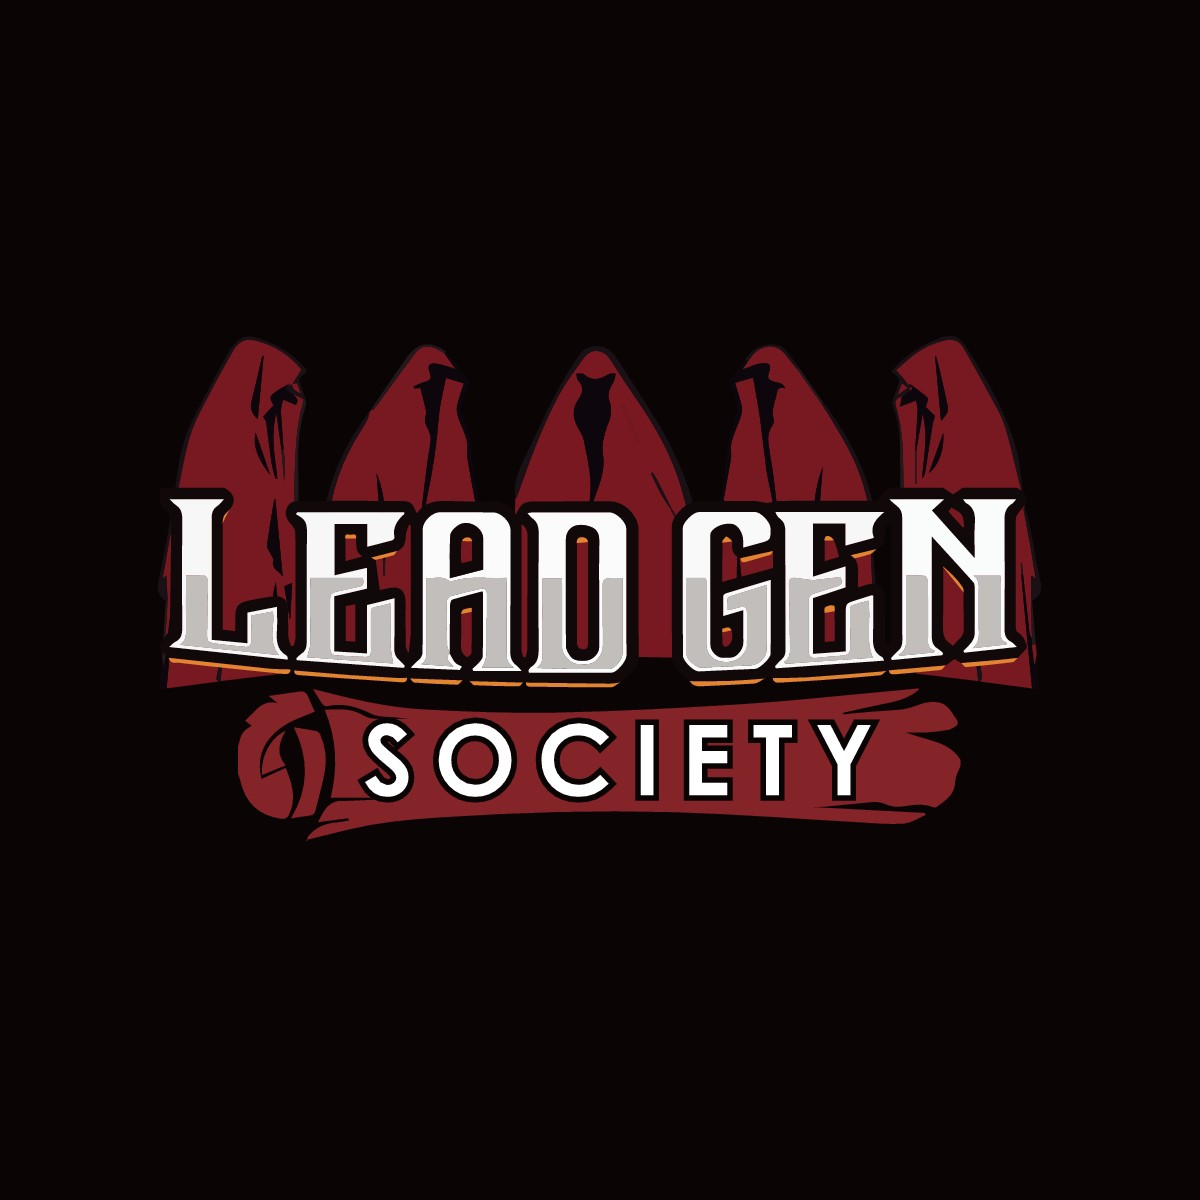 Lead Gen Society